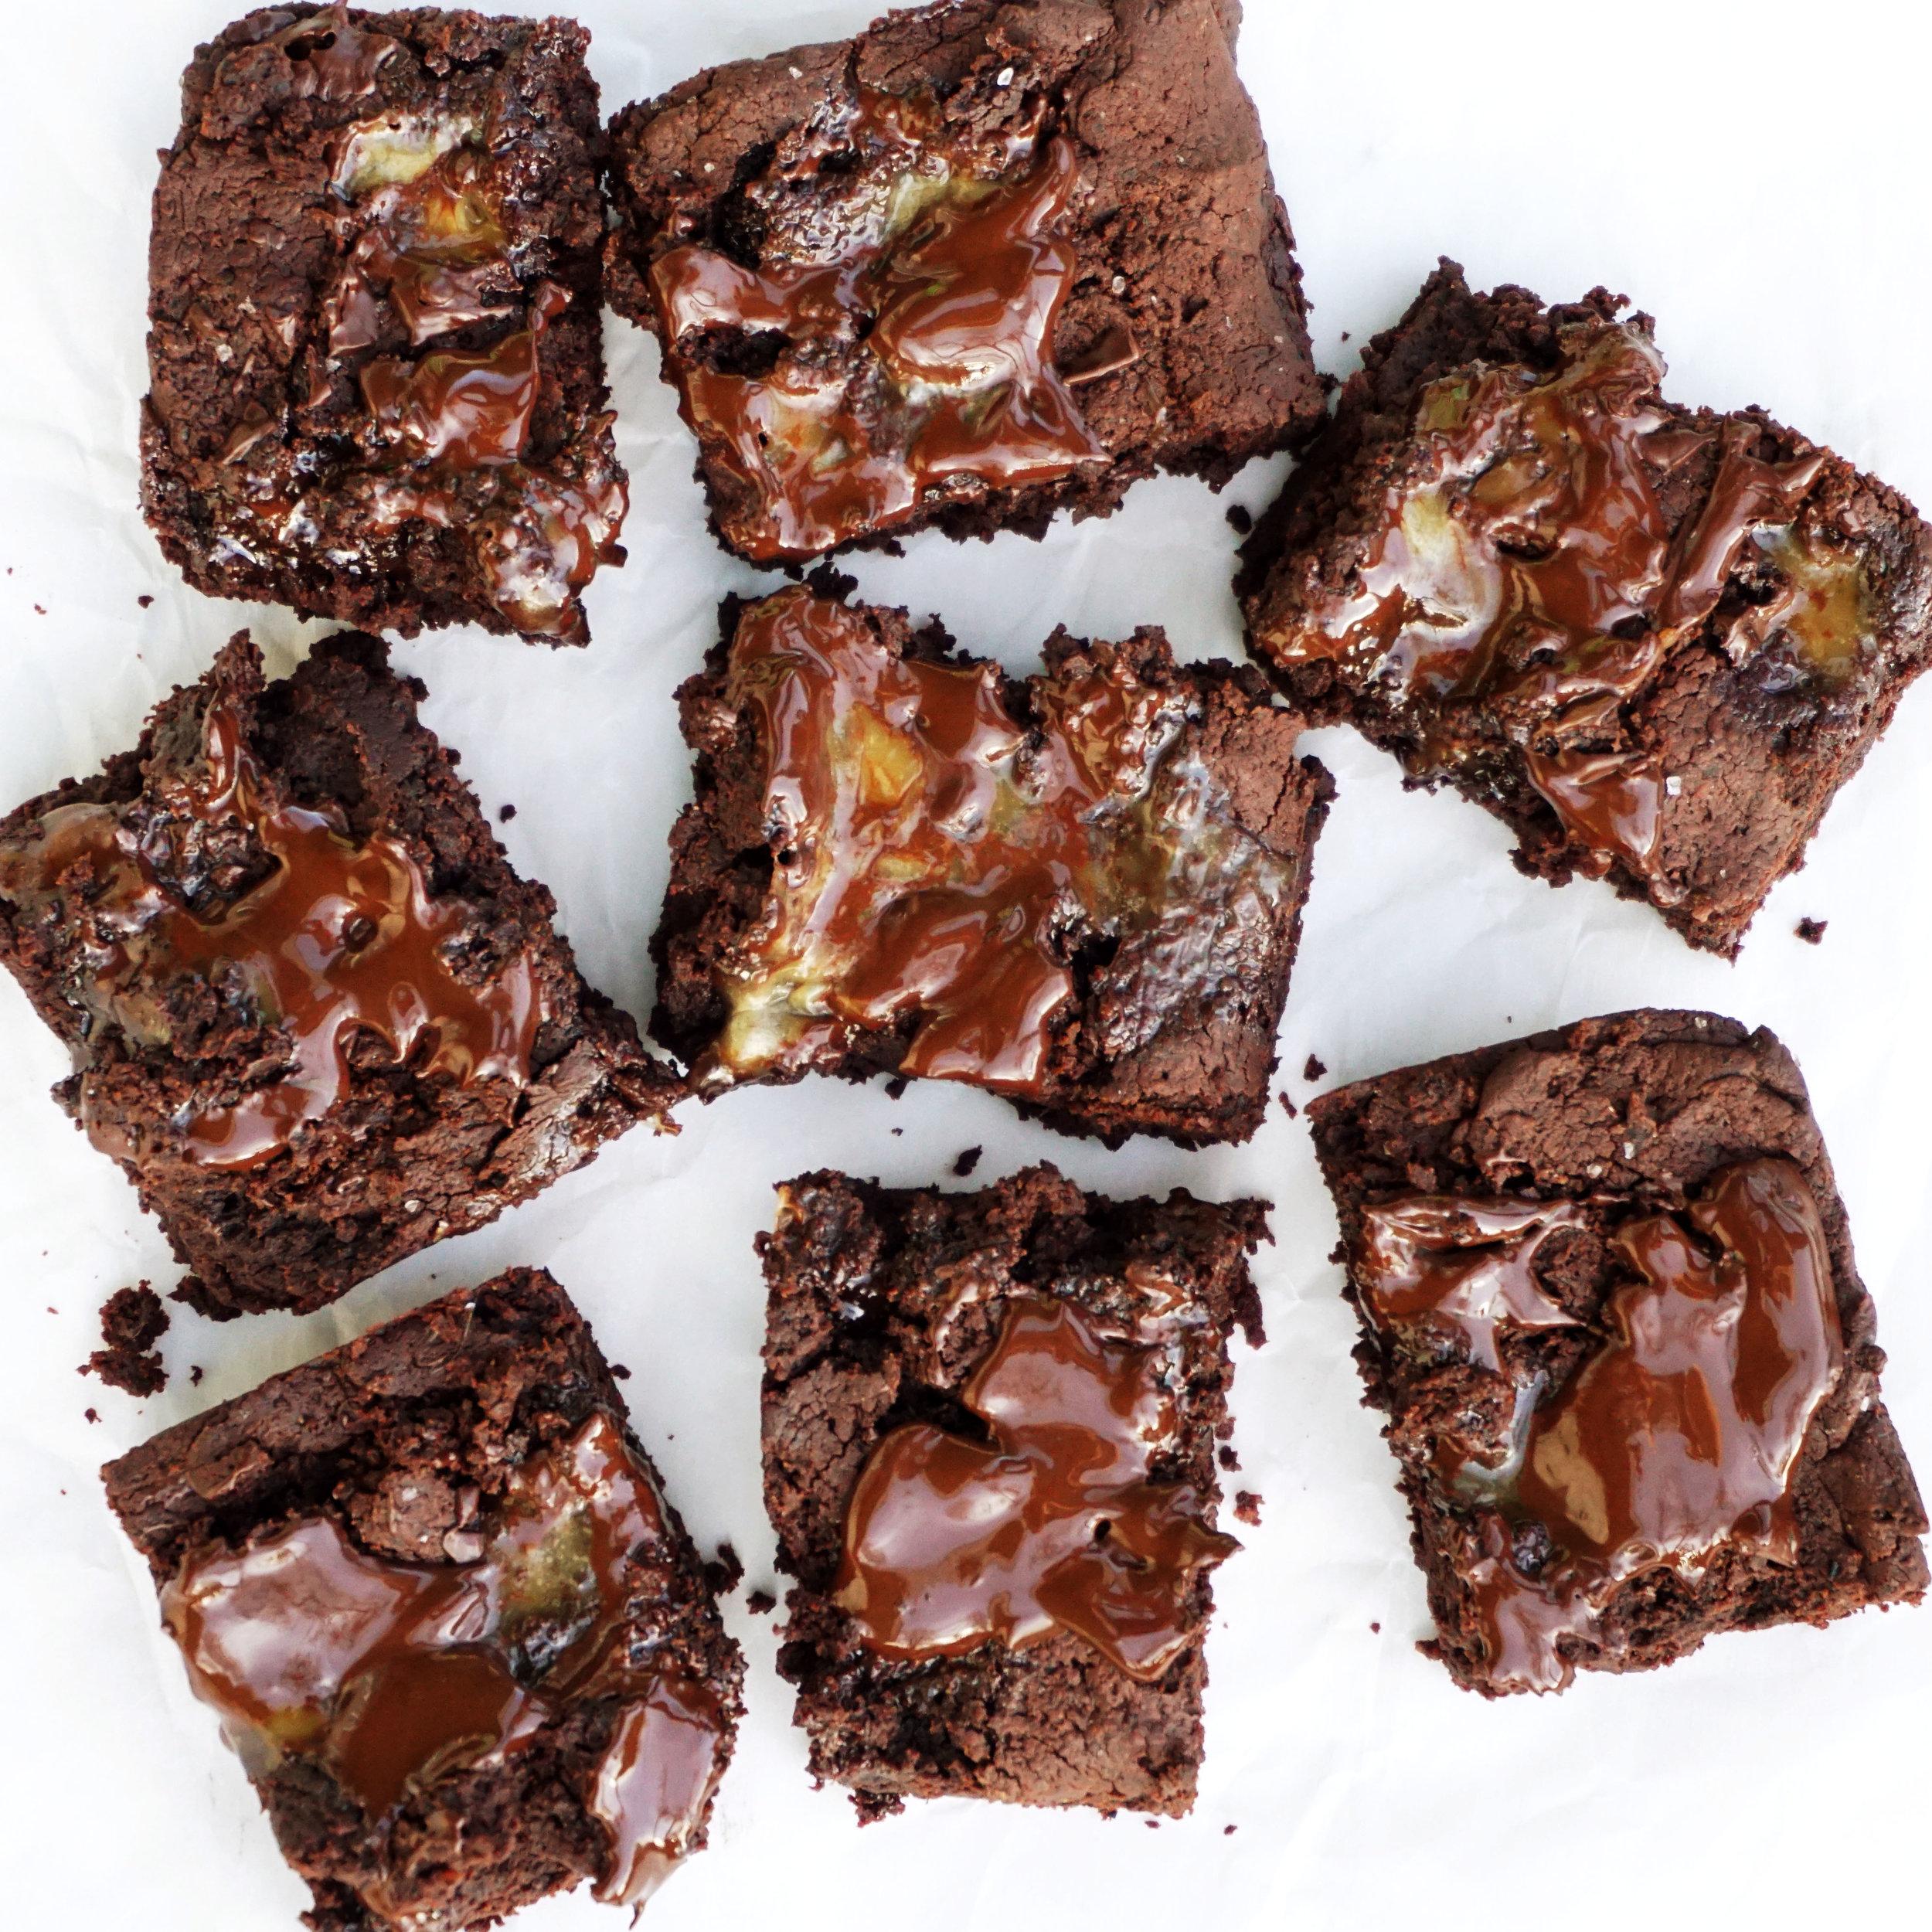 Double-Chocolate Caramel Black Bean Brownies (Vegan, GF)